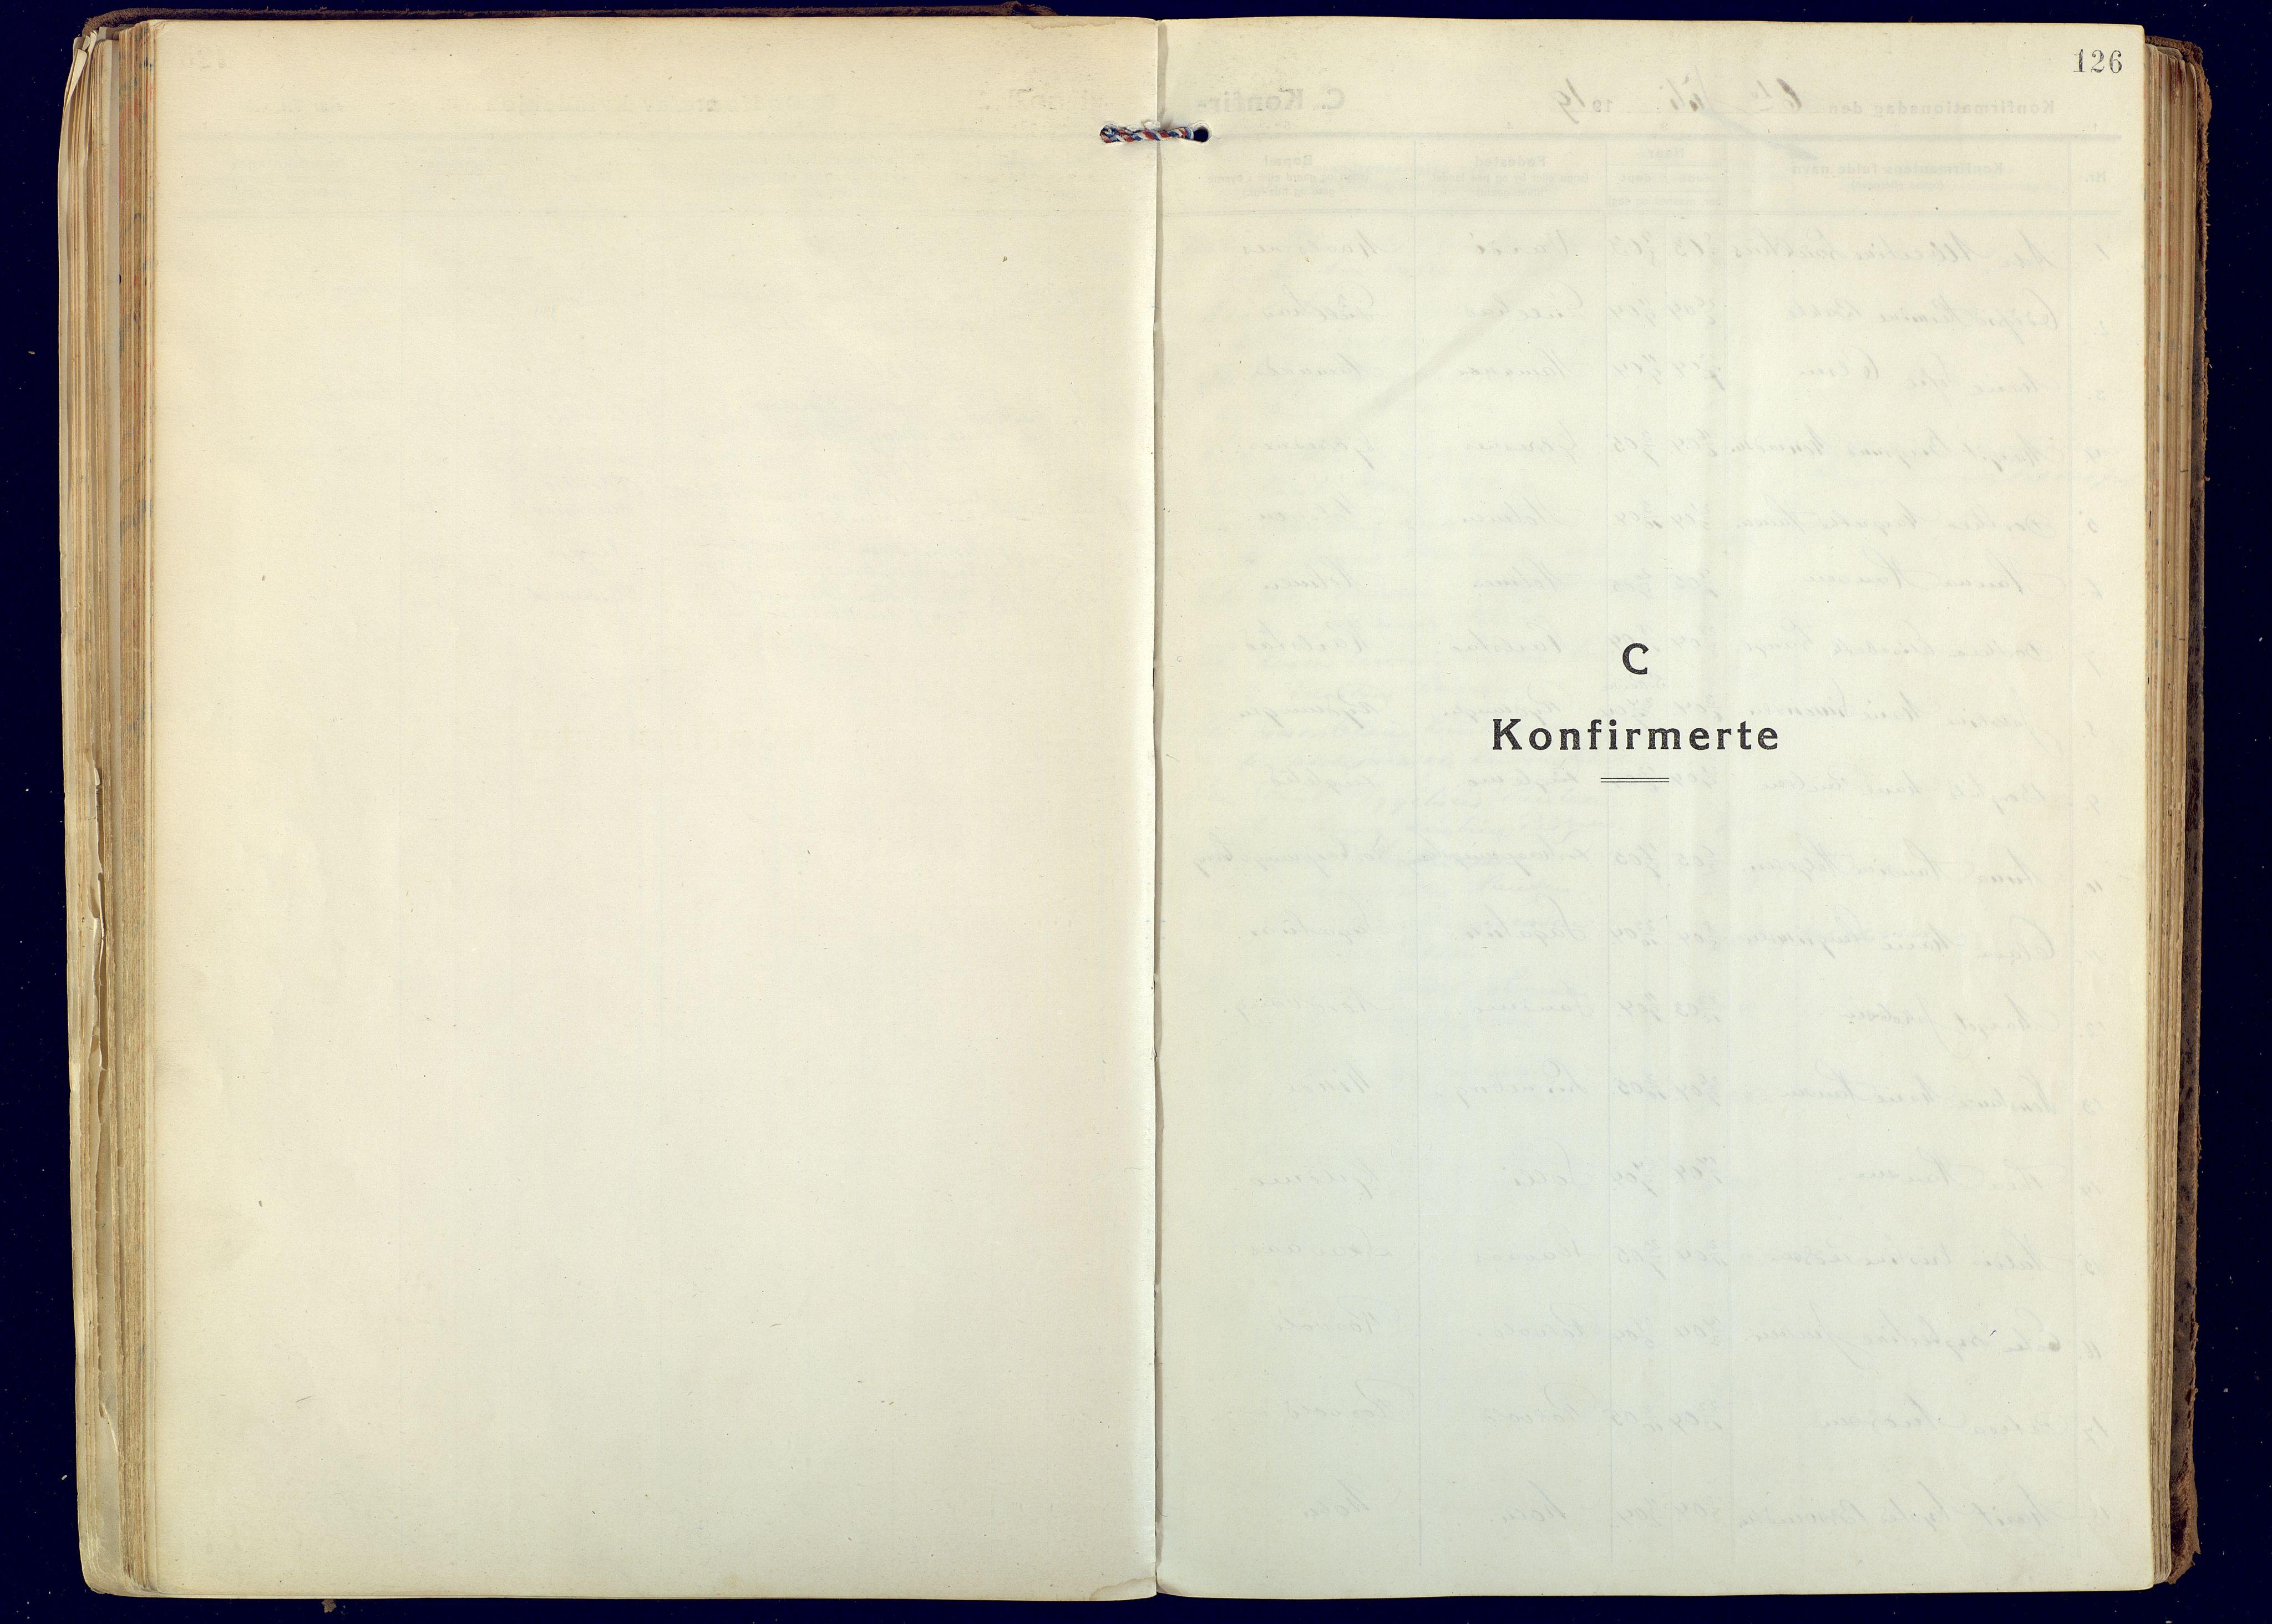 SATØ, Målselv sokneprestembete, Ministerialbok nr. 14, 1919-1932, s. 126